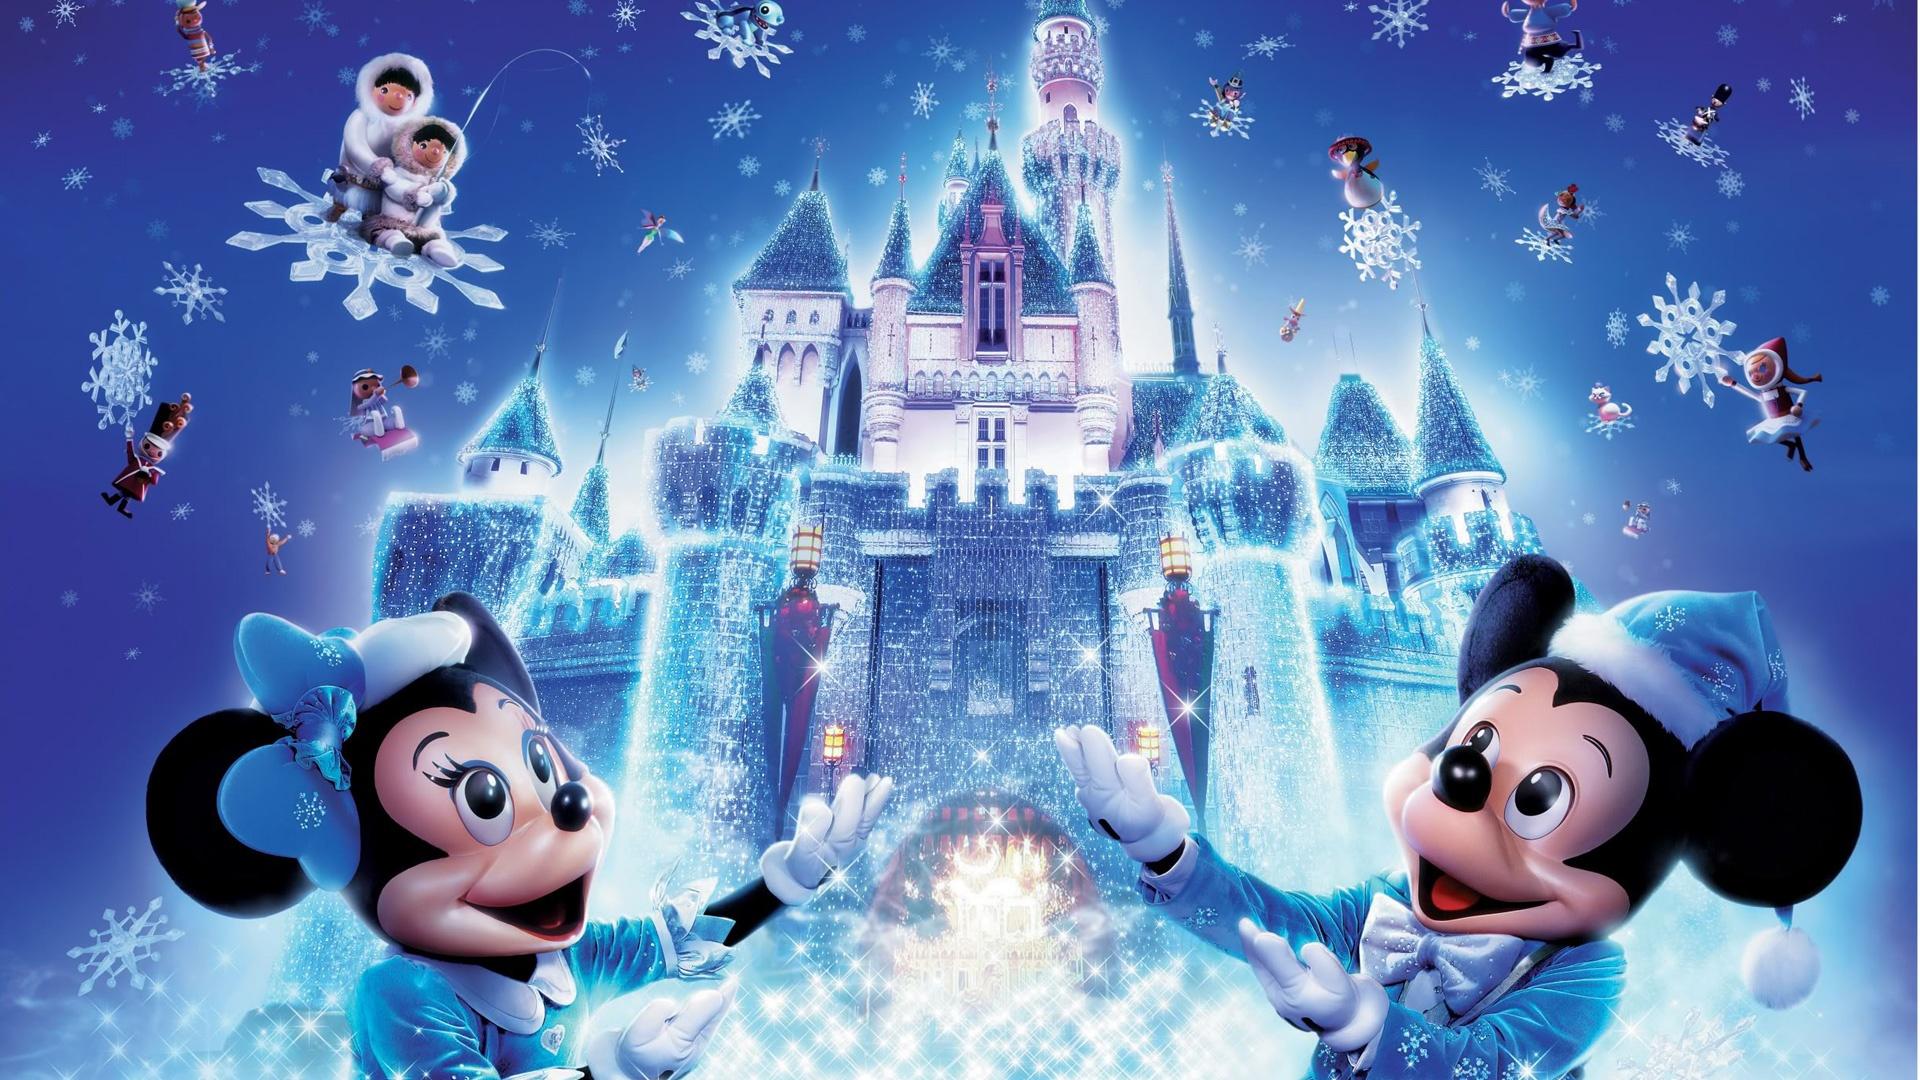 Fondos de pantalla Navidad de Disney Mickey Mouse 1920x1080 Full HD ...